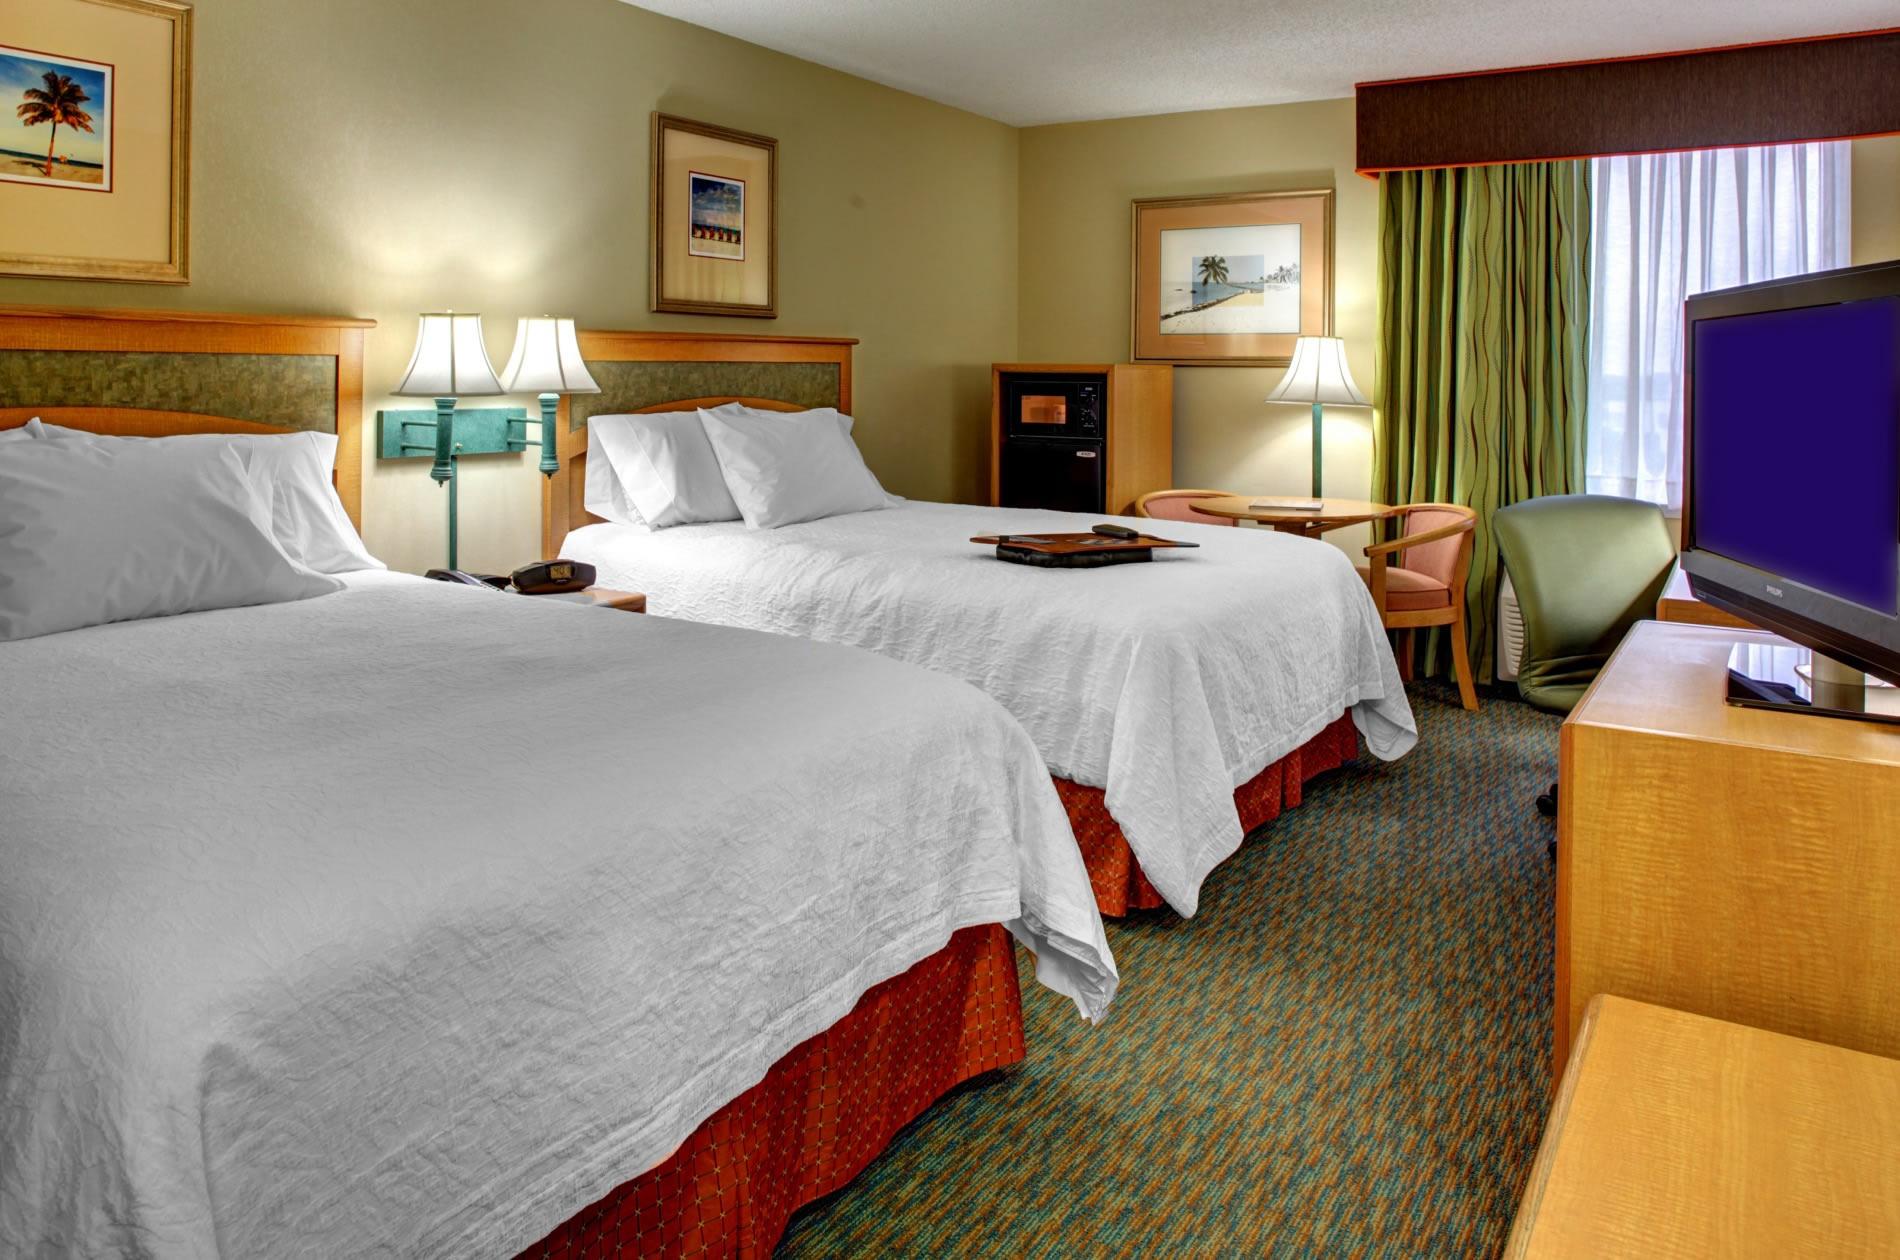 Hampton Inn by Hilton Pembroke Pines - Fort Lauderdale West image 5